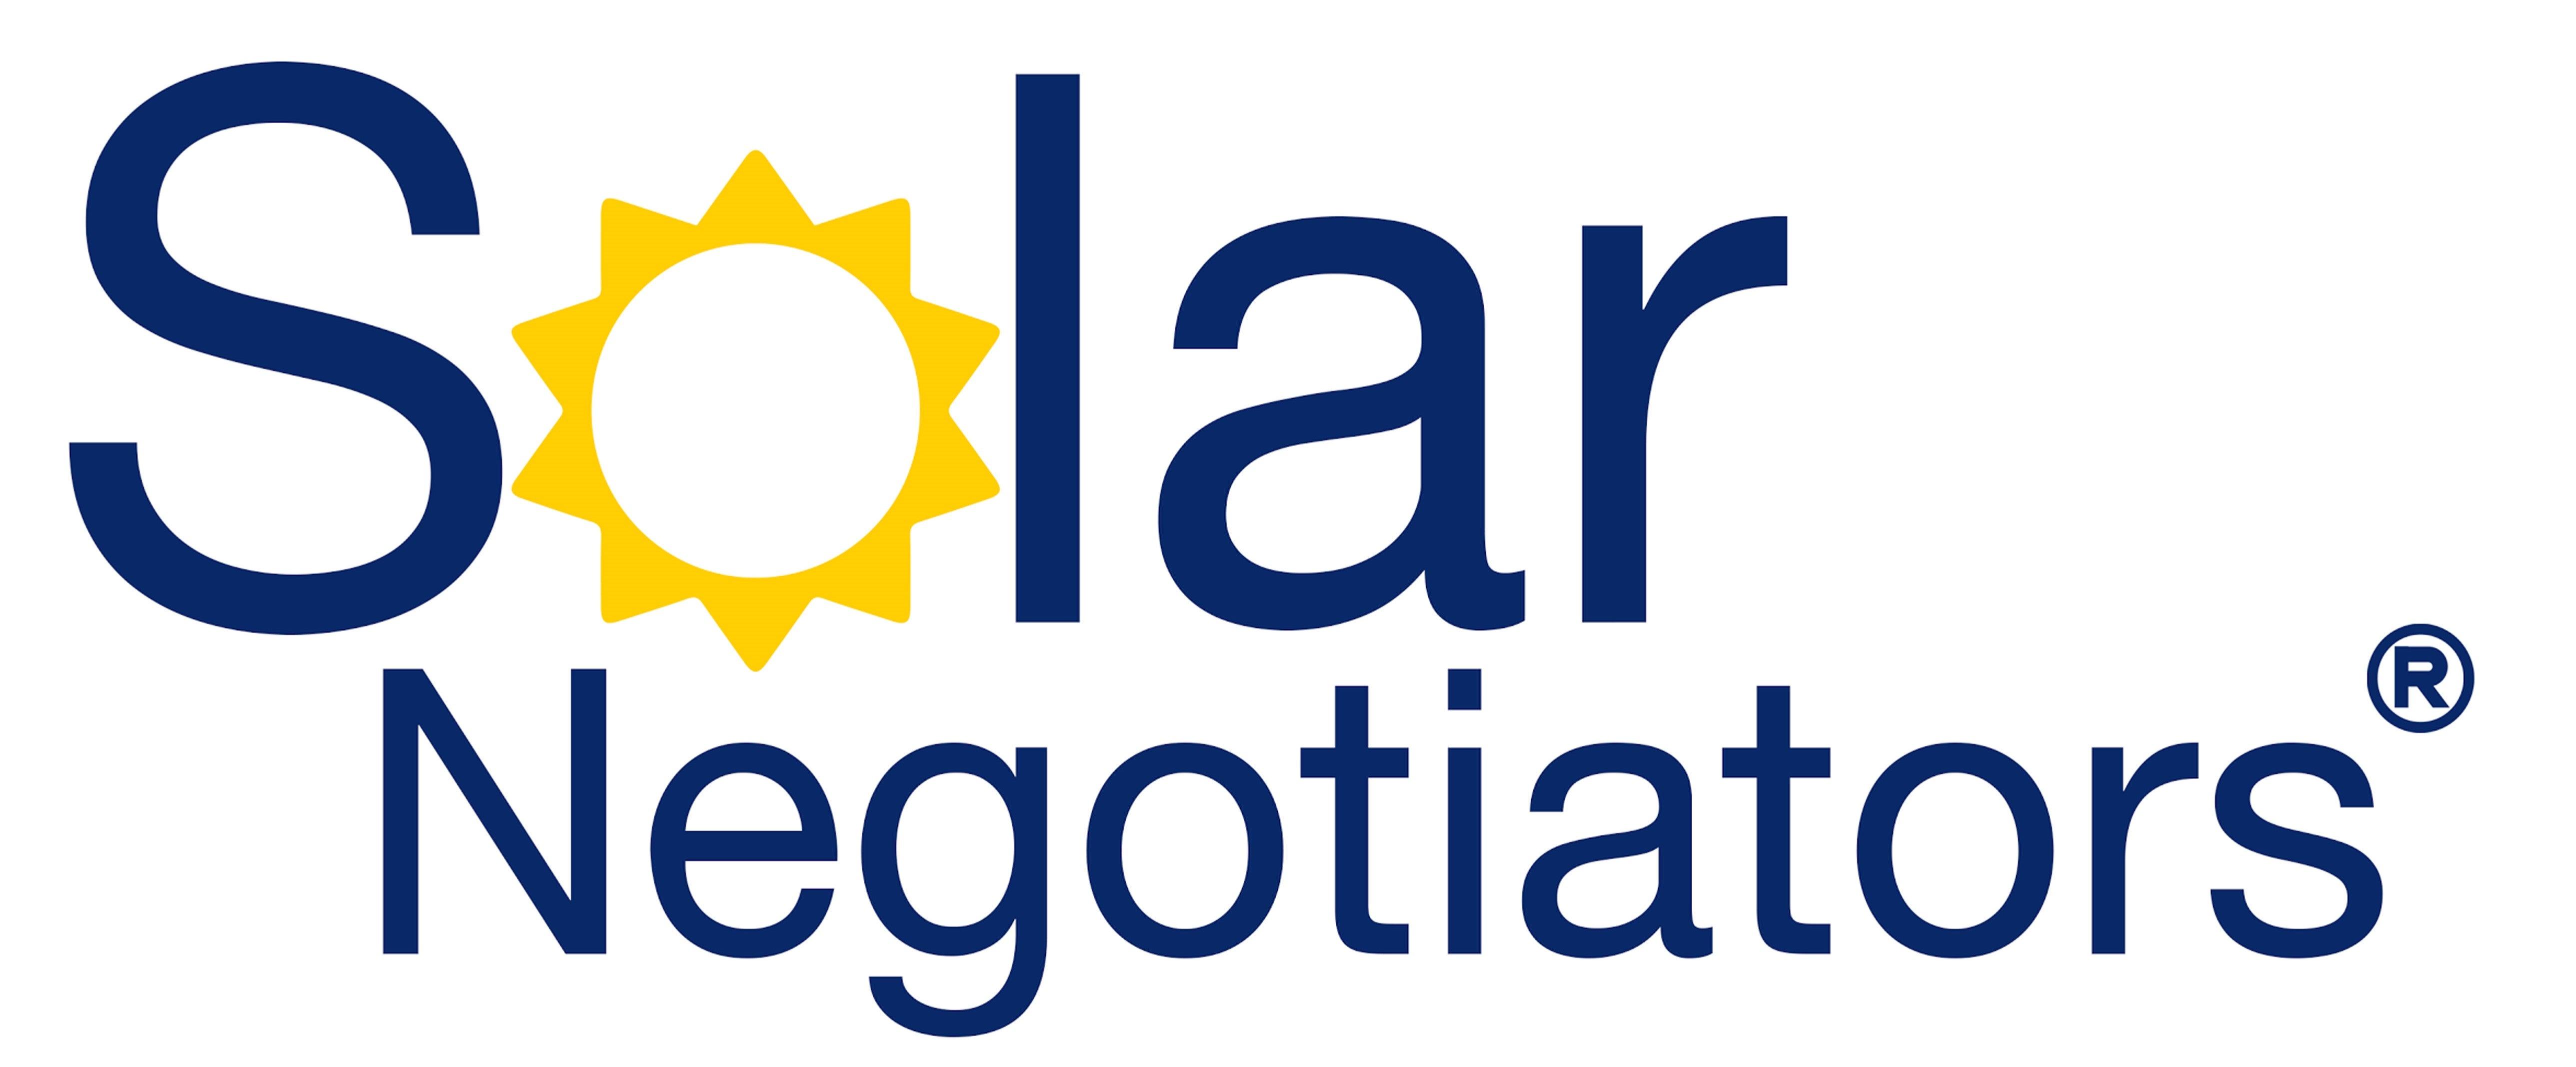 Vivint solar reviews california - Solar Negotiators Reviews Solar Negotiators Cost Solar Negotiators Solar Panels Locations And Complaints